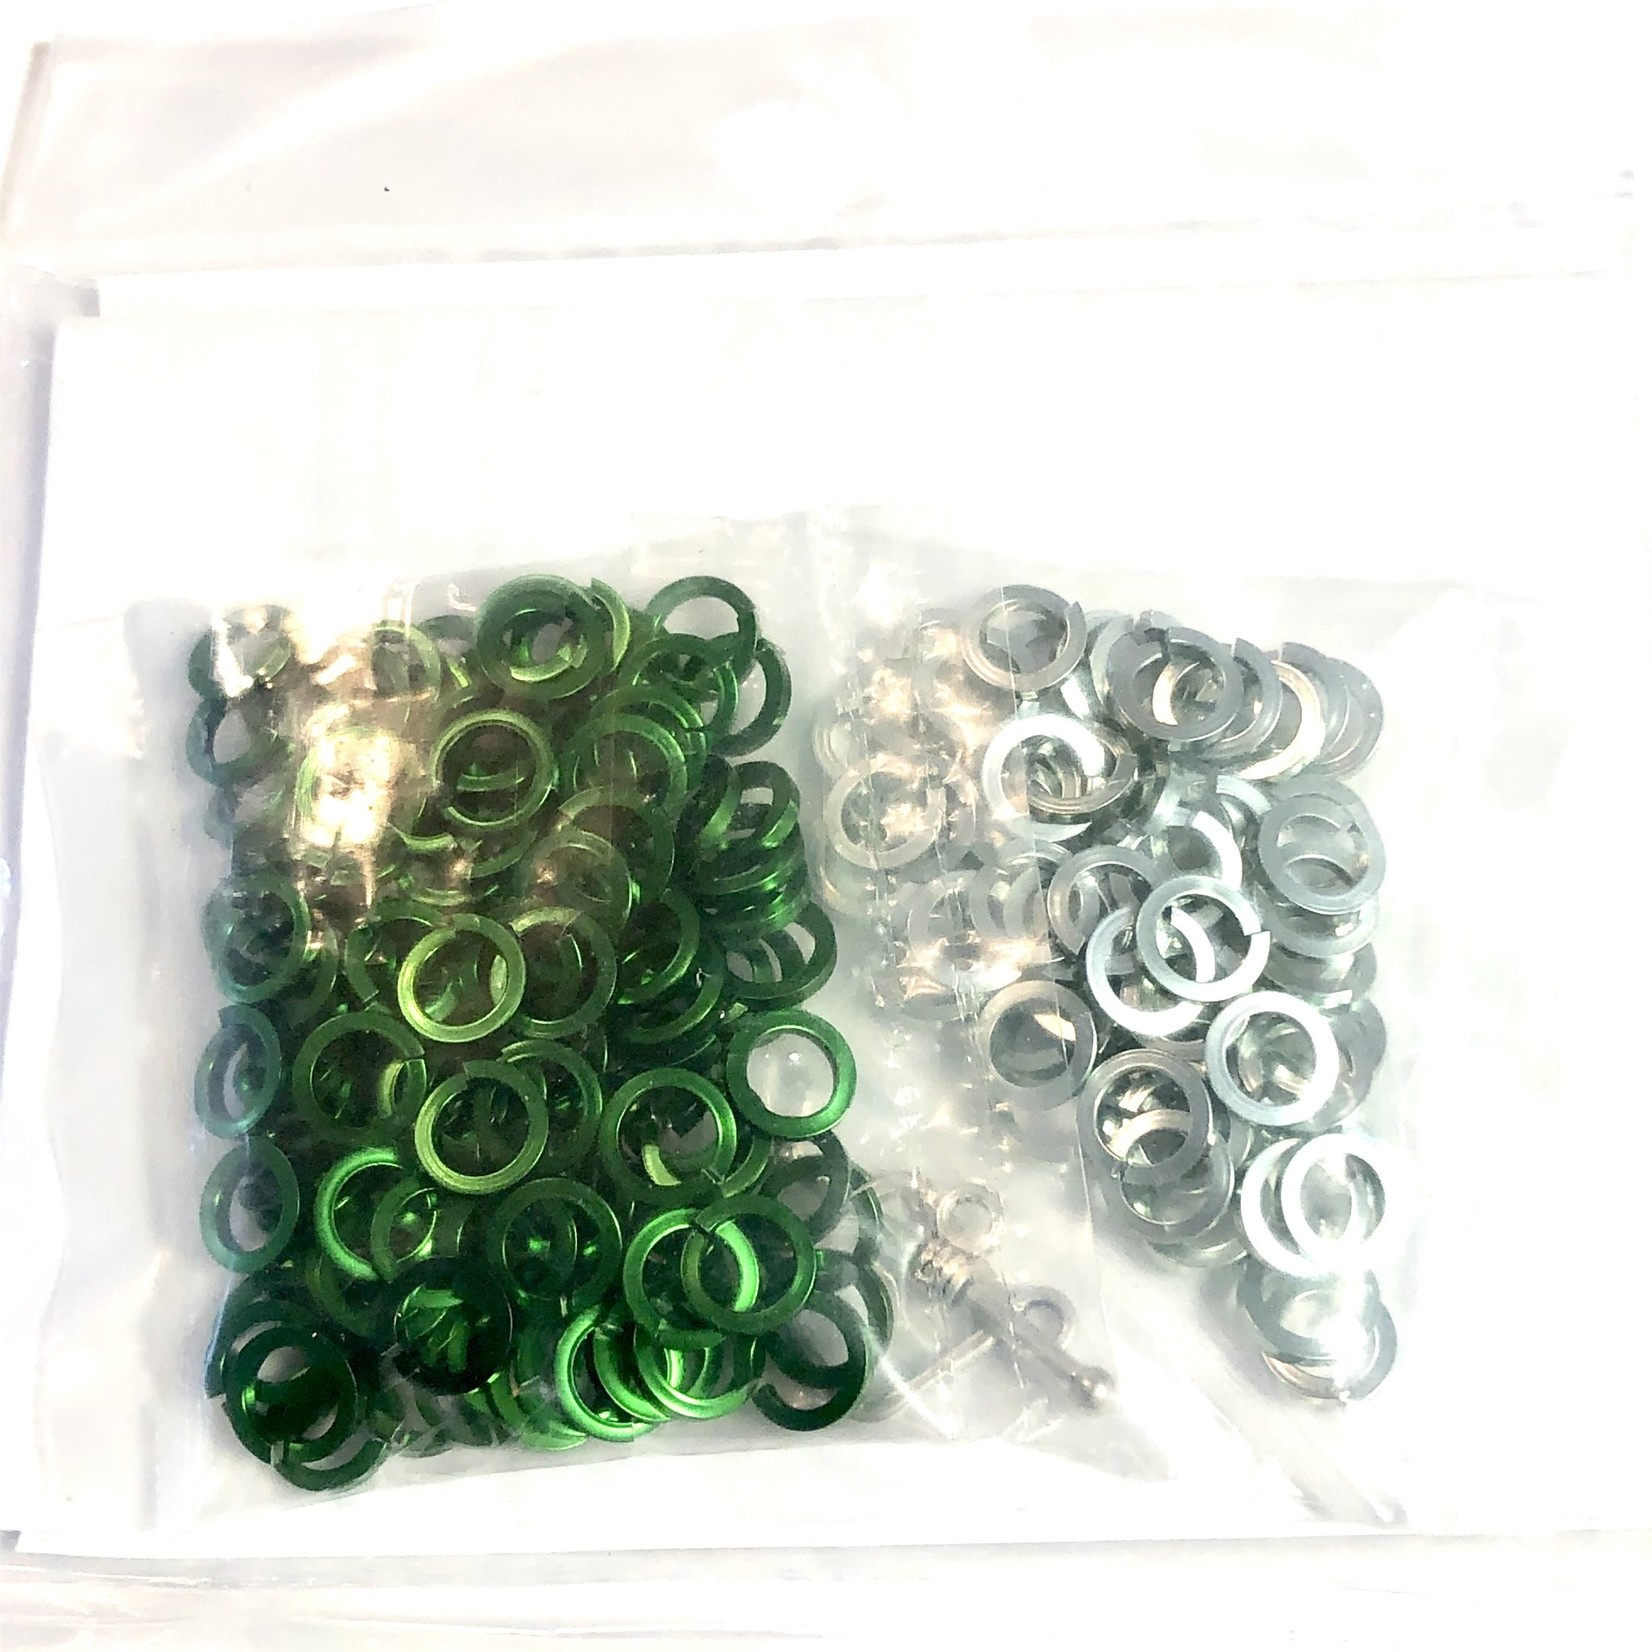 Hyperlinks Chain Maille Sq Byzantine Bracelet Kit Green & Seafoam